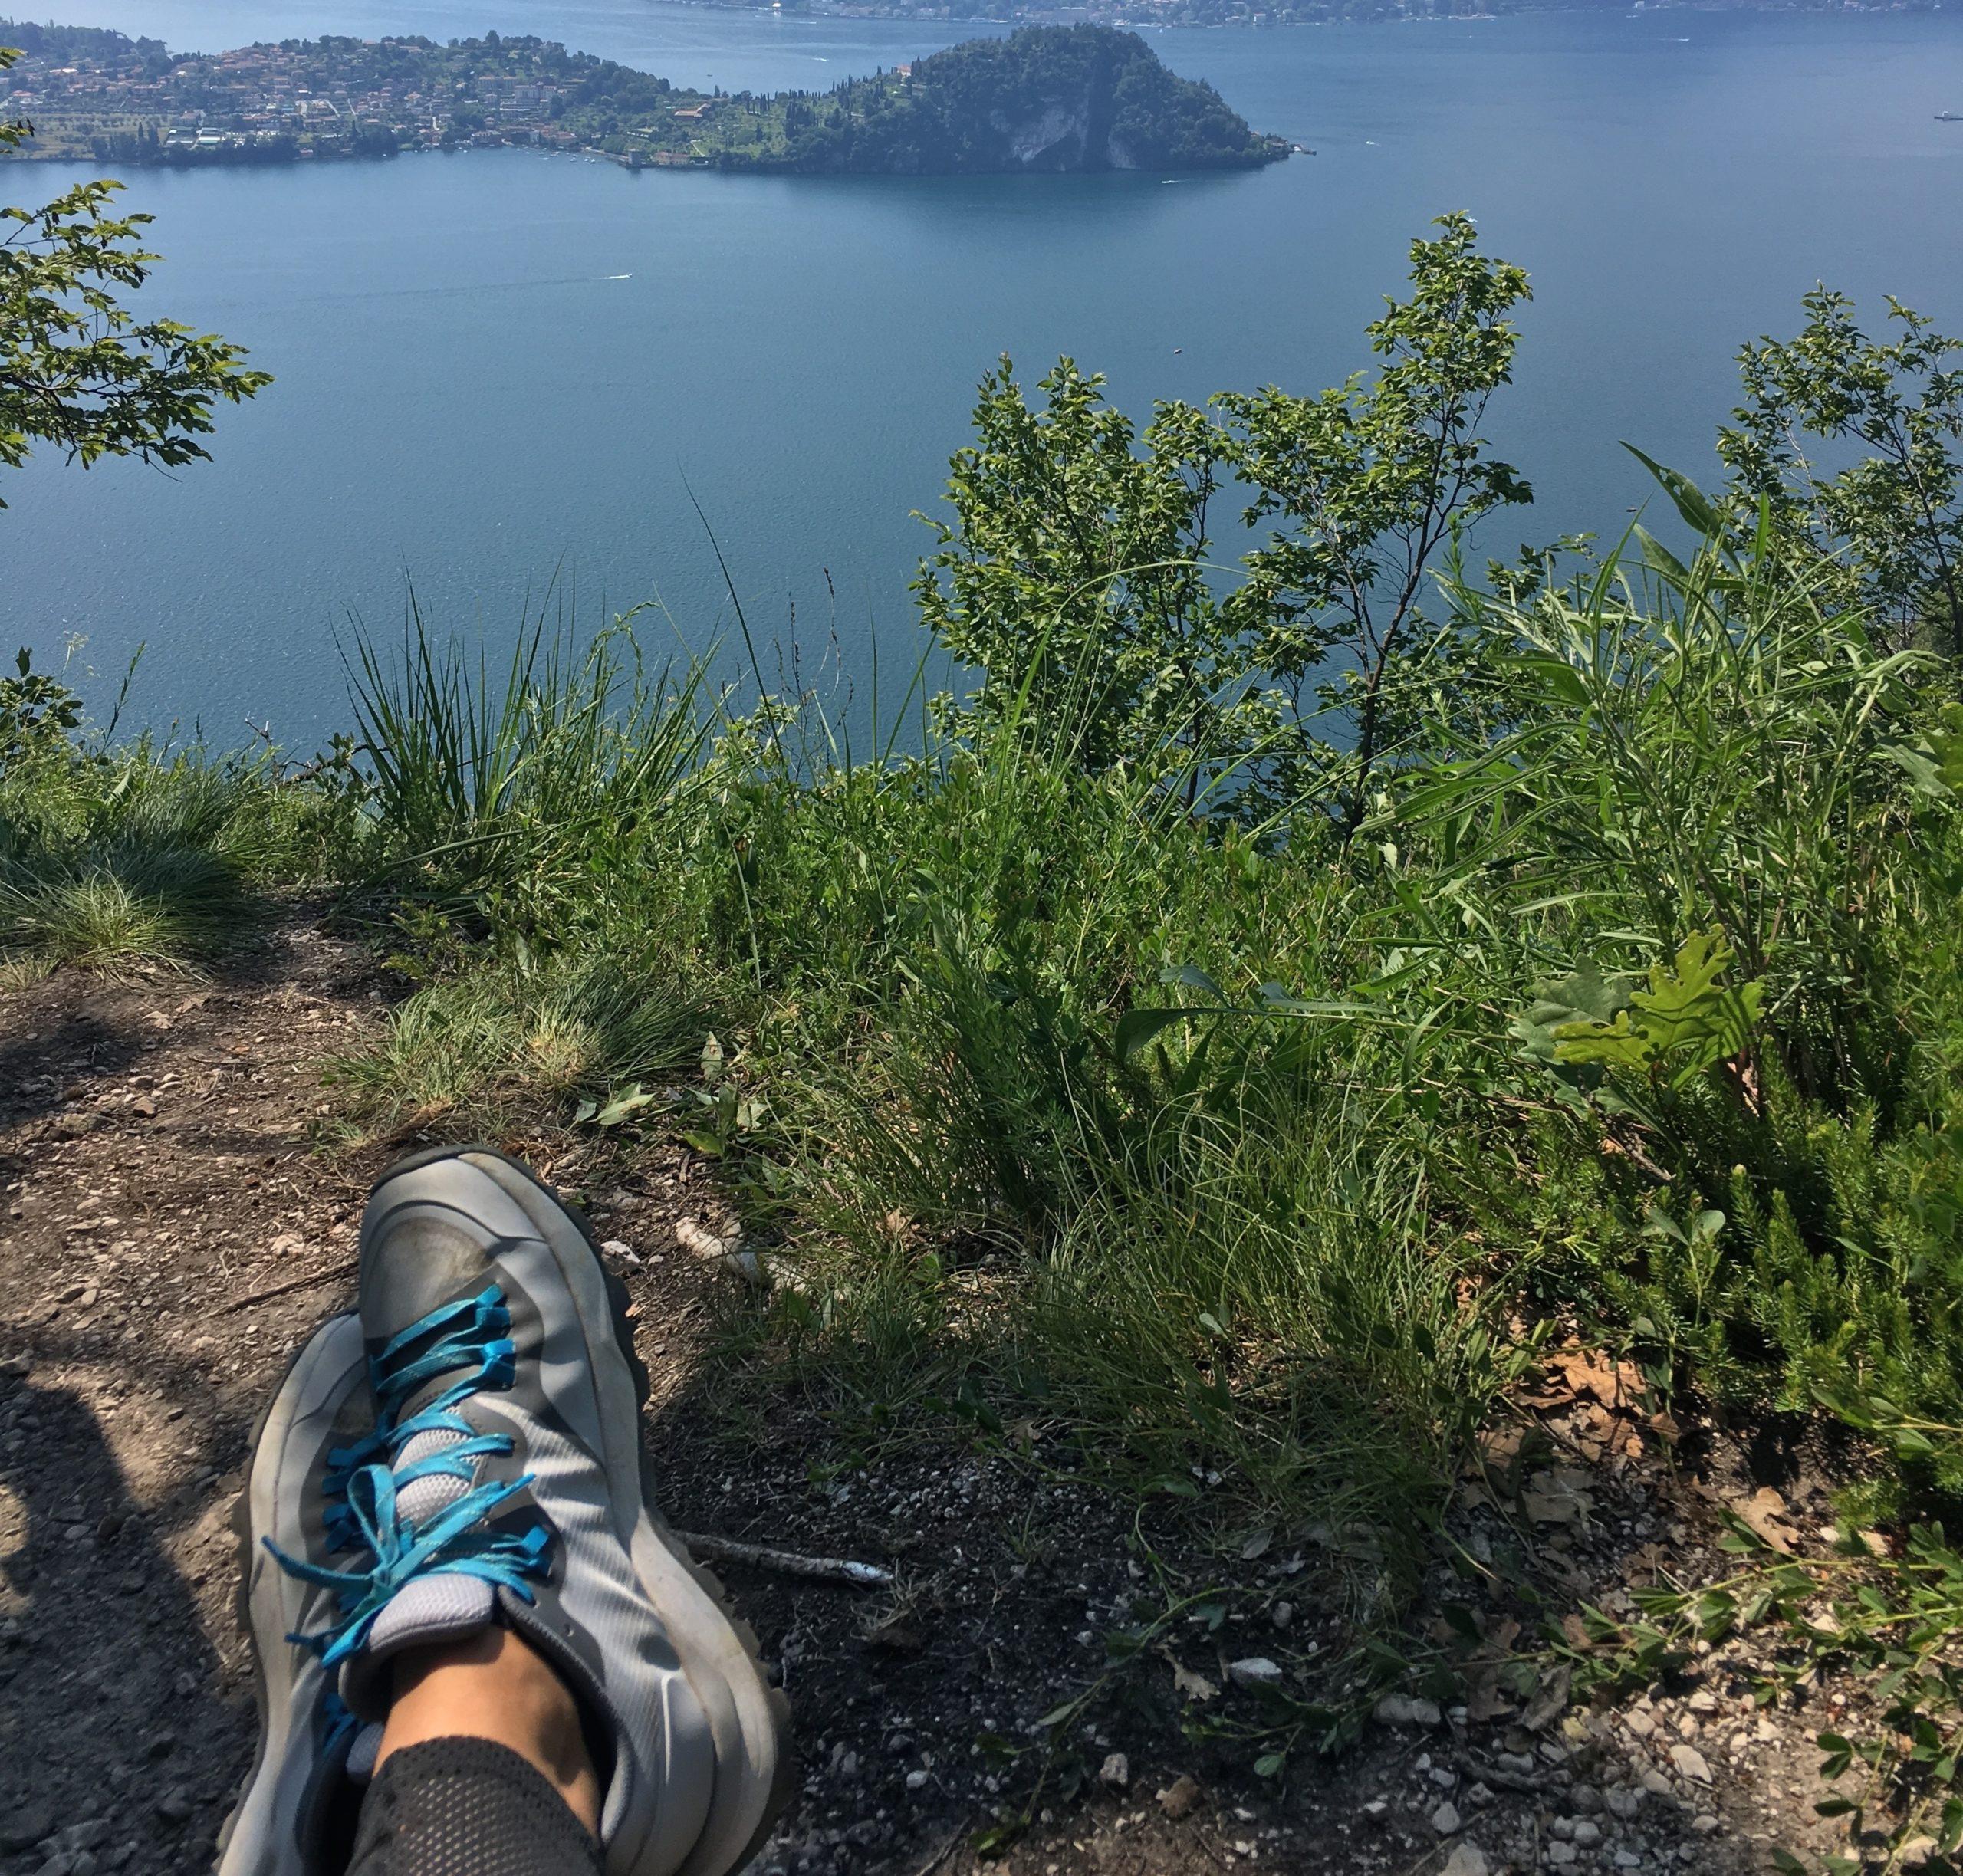 Guida al trekking sara caulfield